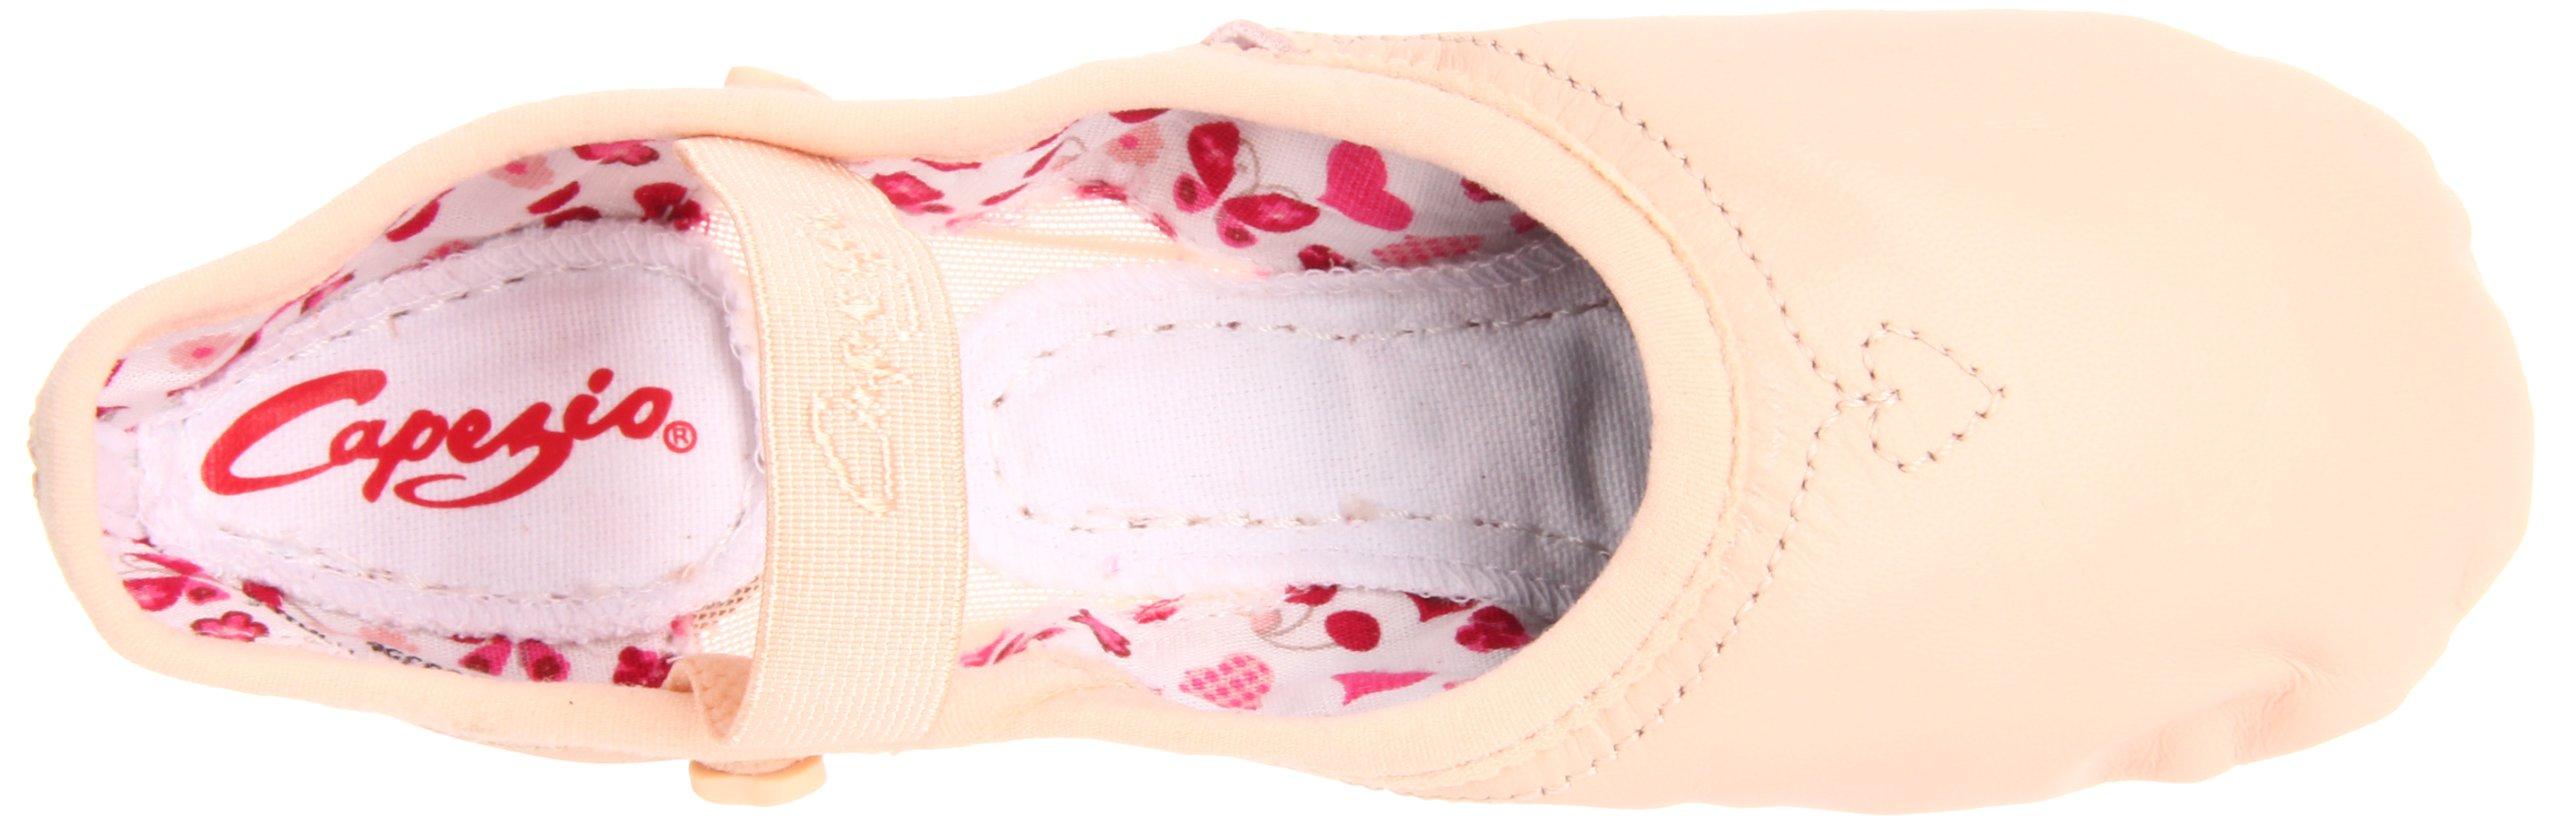 Capezio Love Ballet Flat (Toddler/Little Kid),Pink,1 M US Little Kid by Capezio (Image #7)